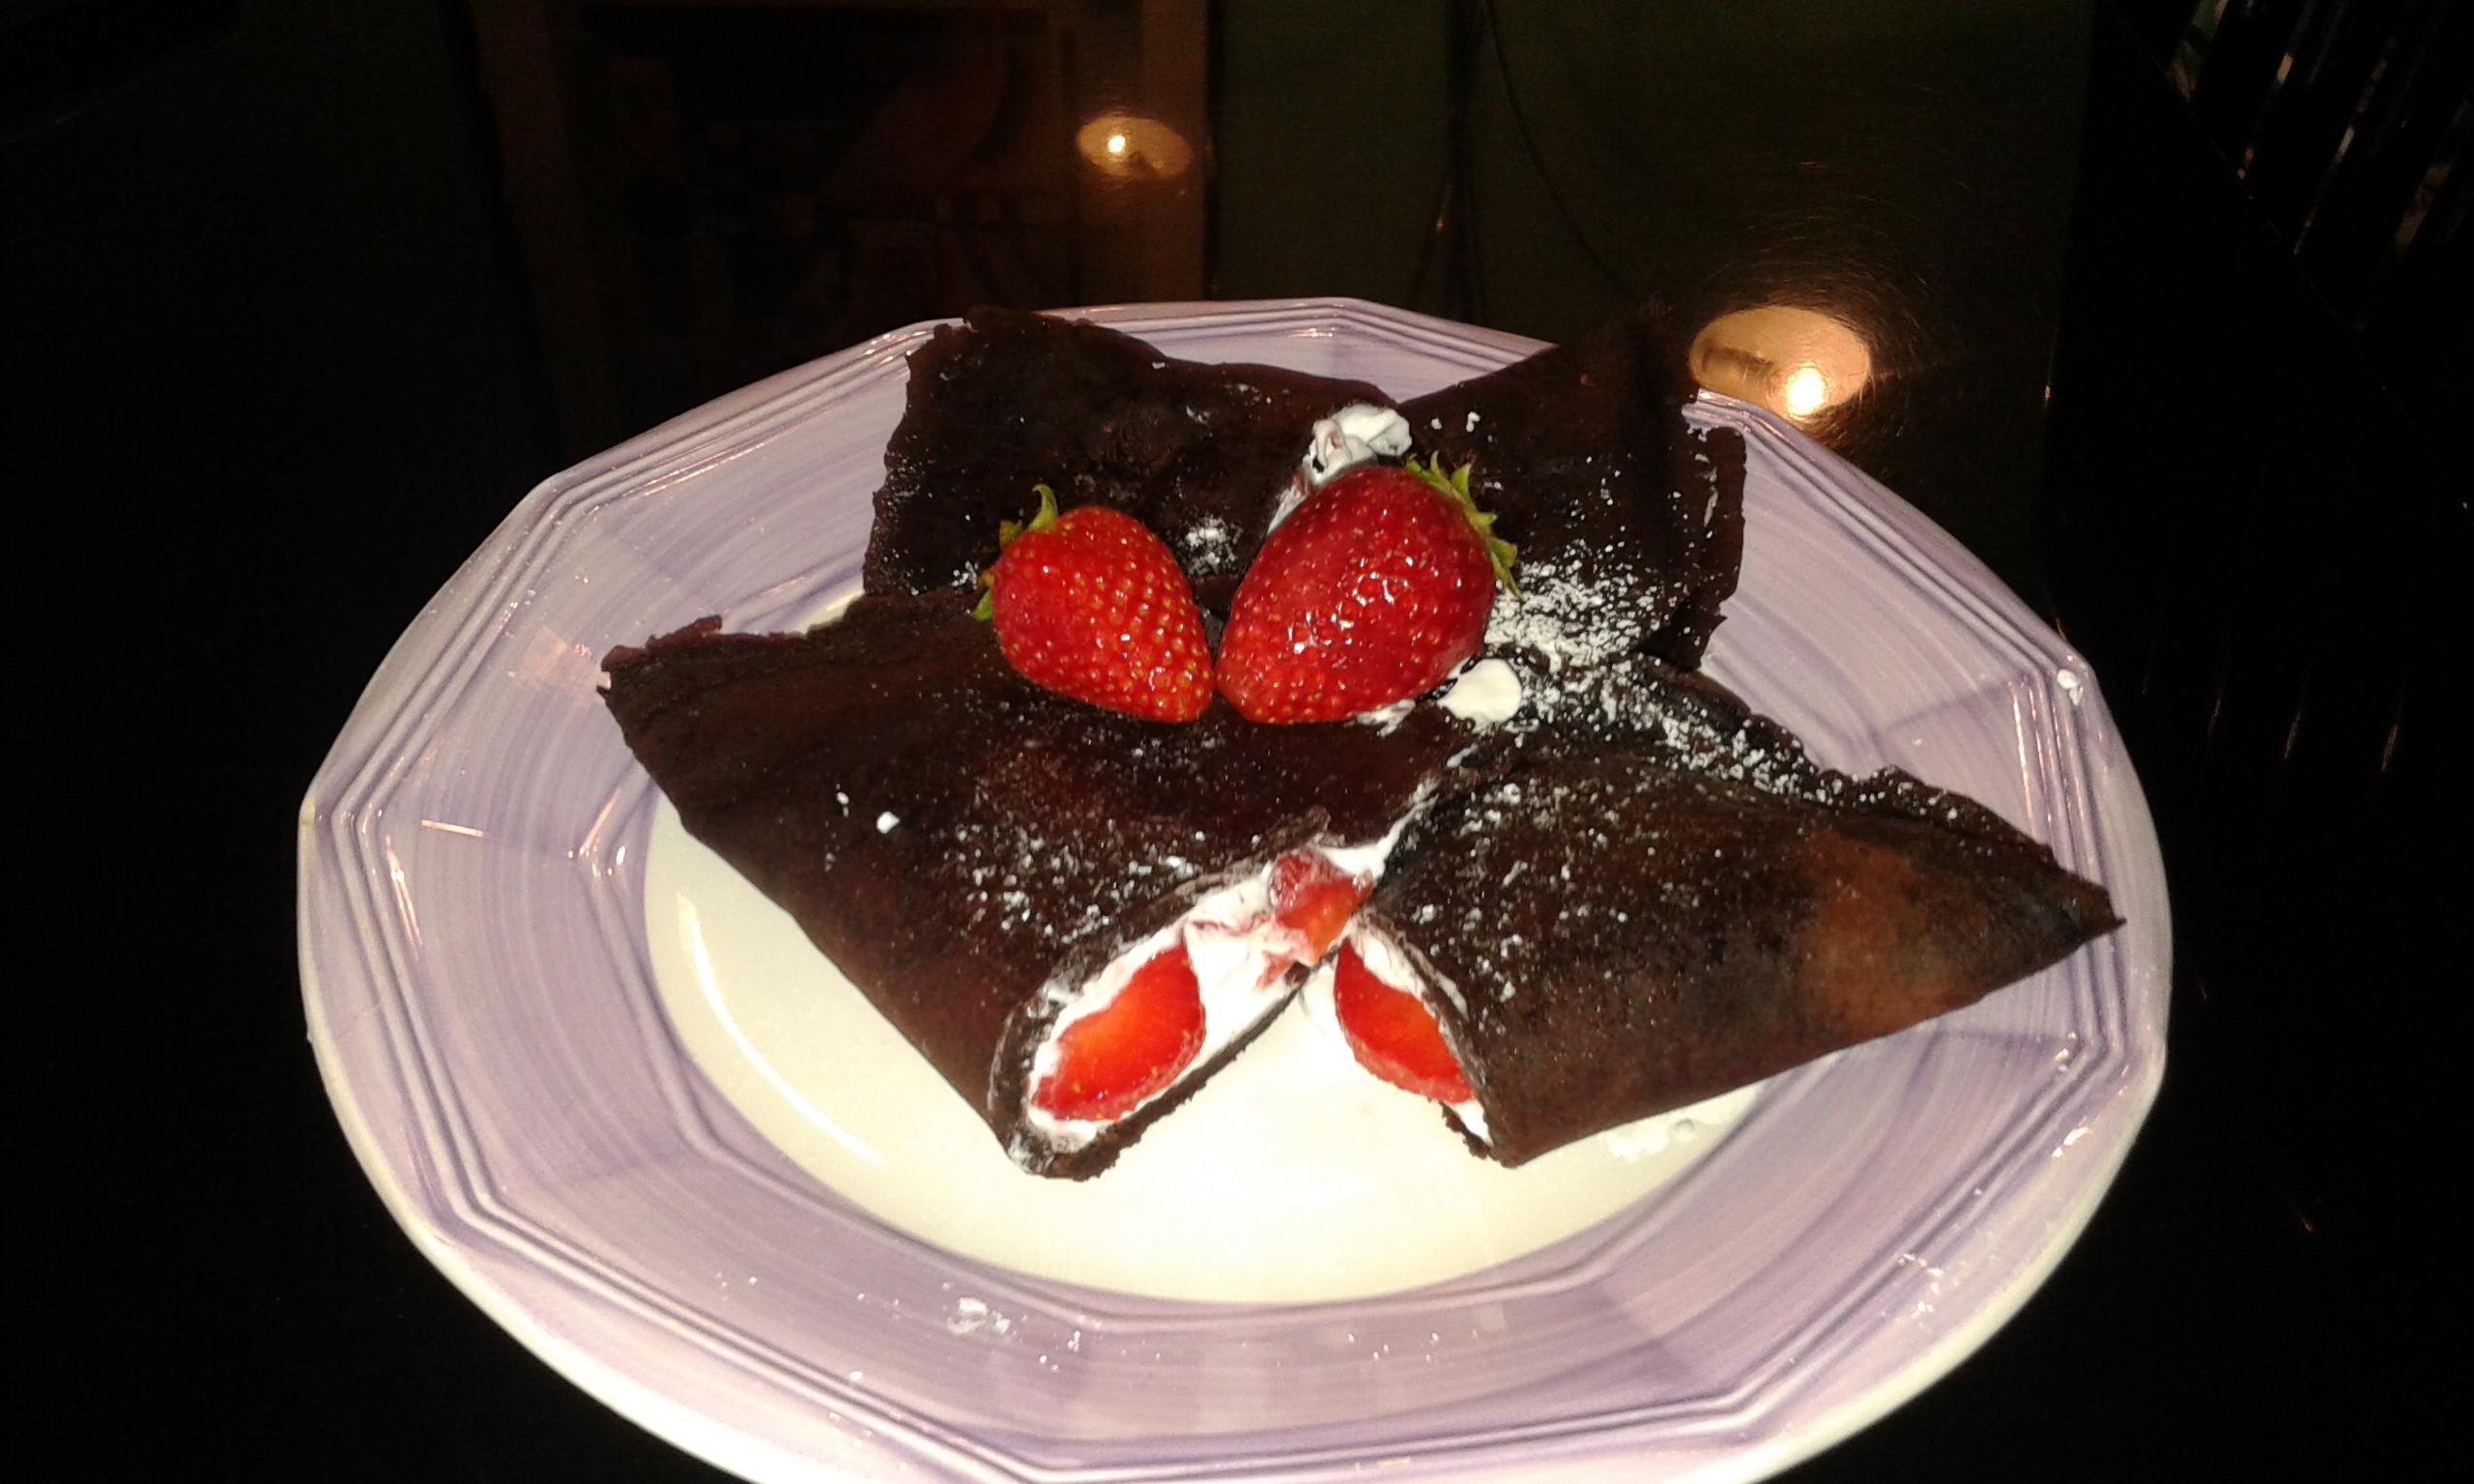 Crepes al cioccolato con fragole e panna montata